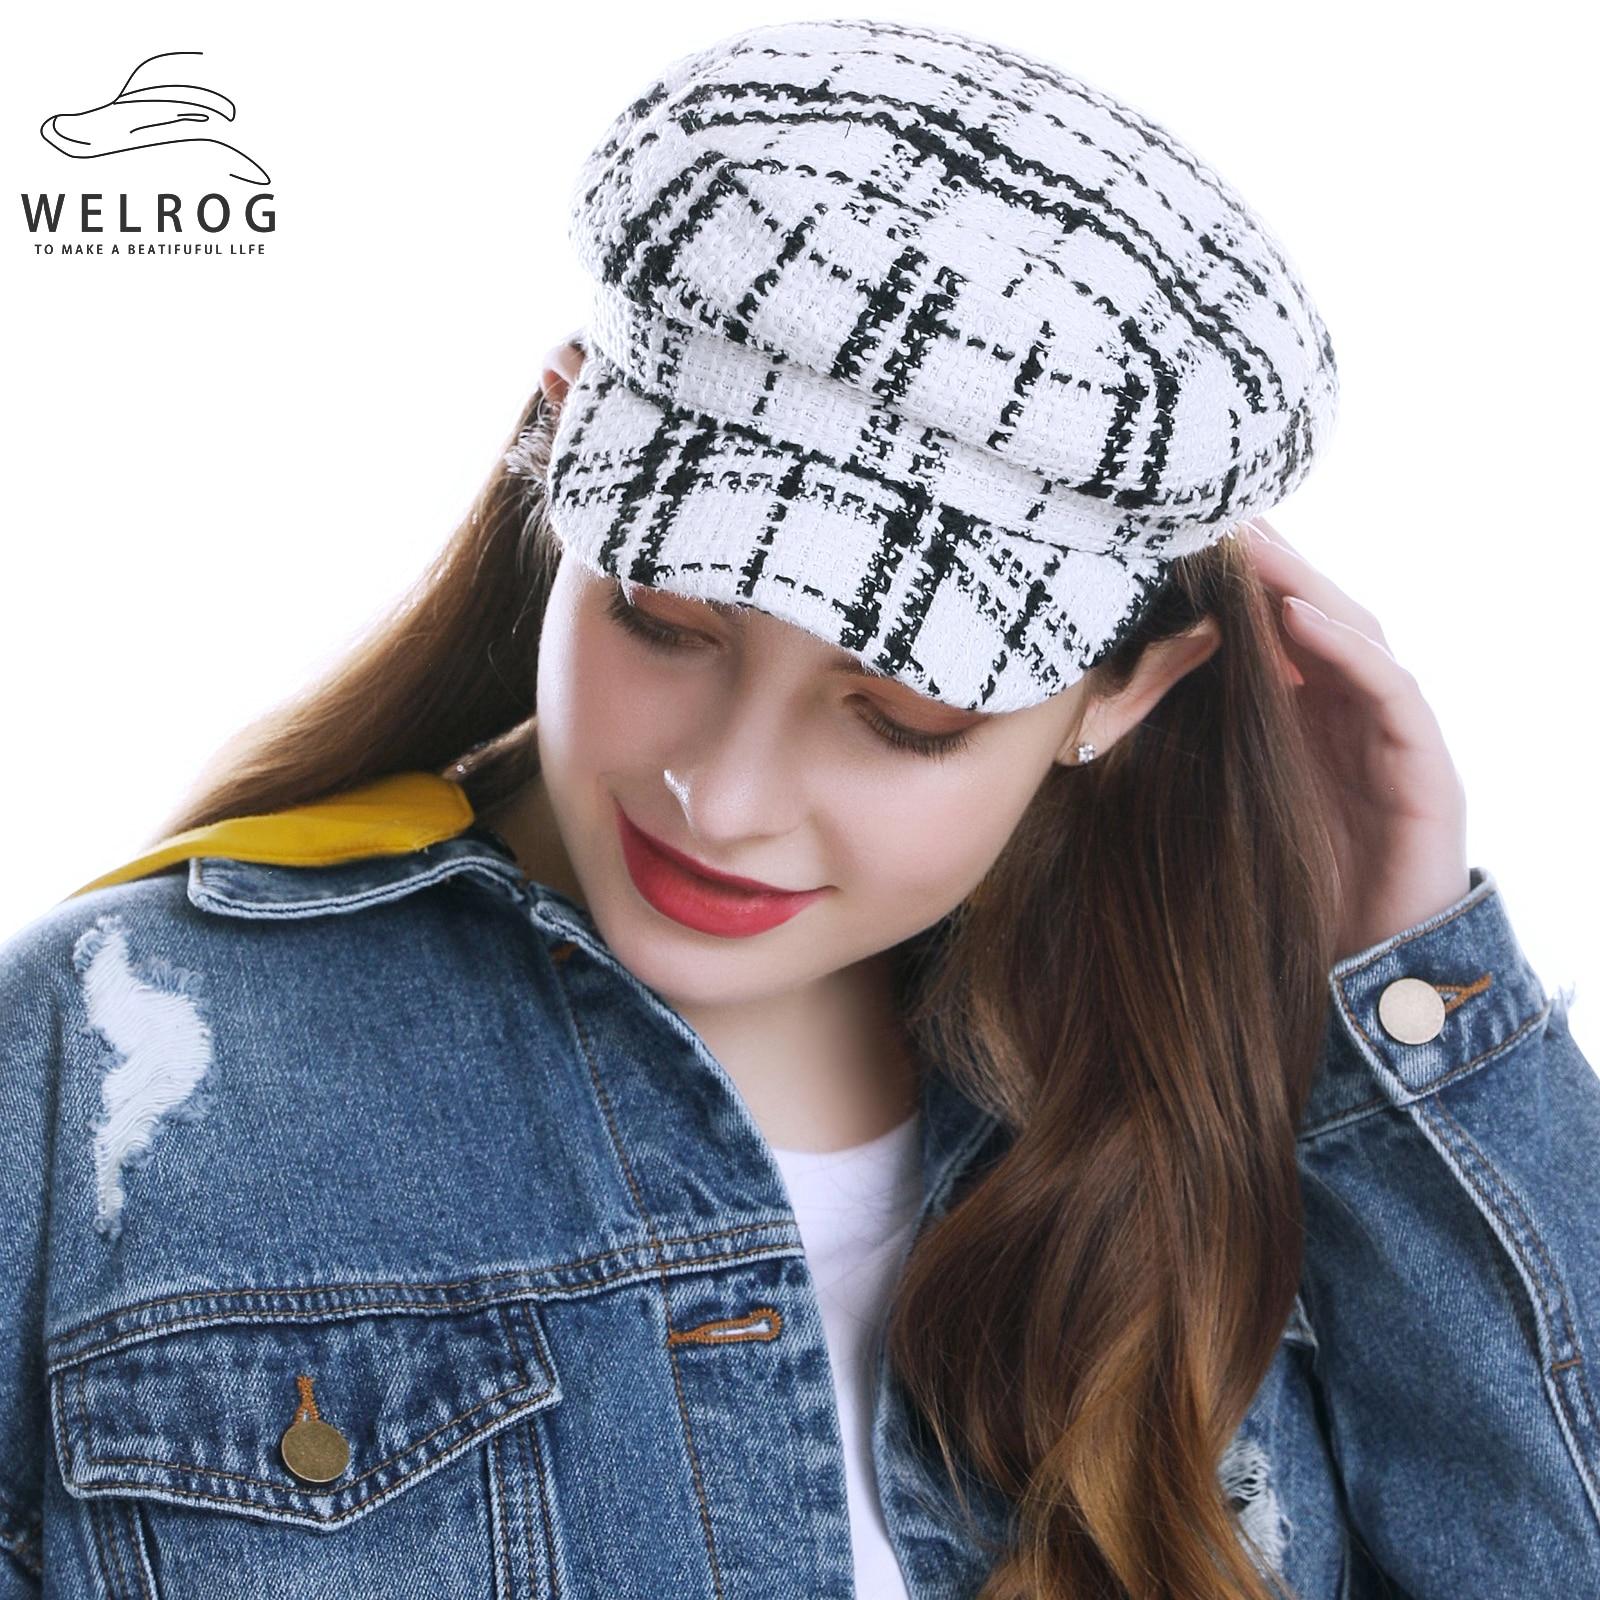 WELROG Newsboy Hat for Women New Autumn Octagonal Beret Hat Female Plaid White Black Painter Cap Winter Striped Hats